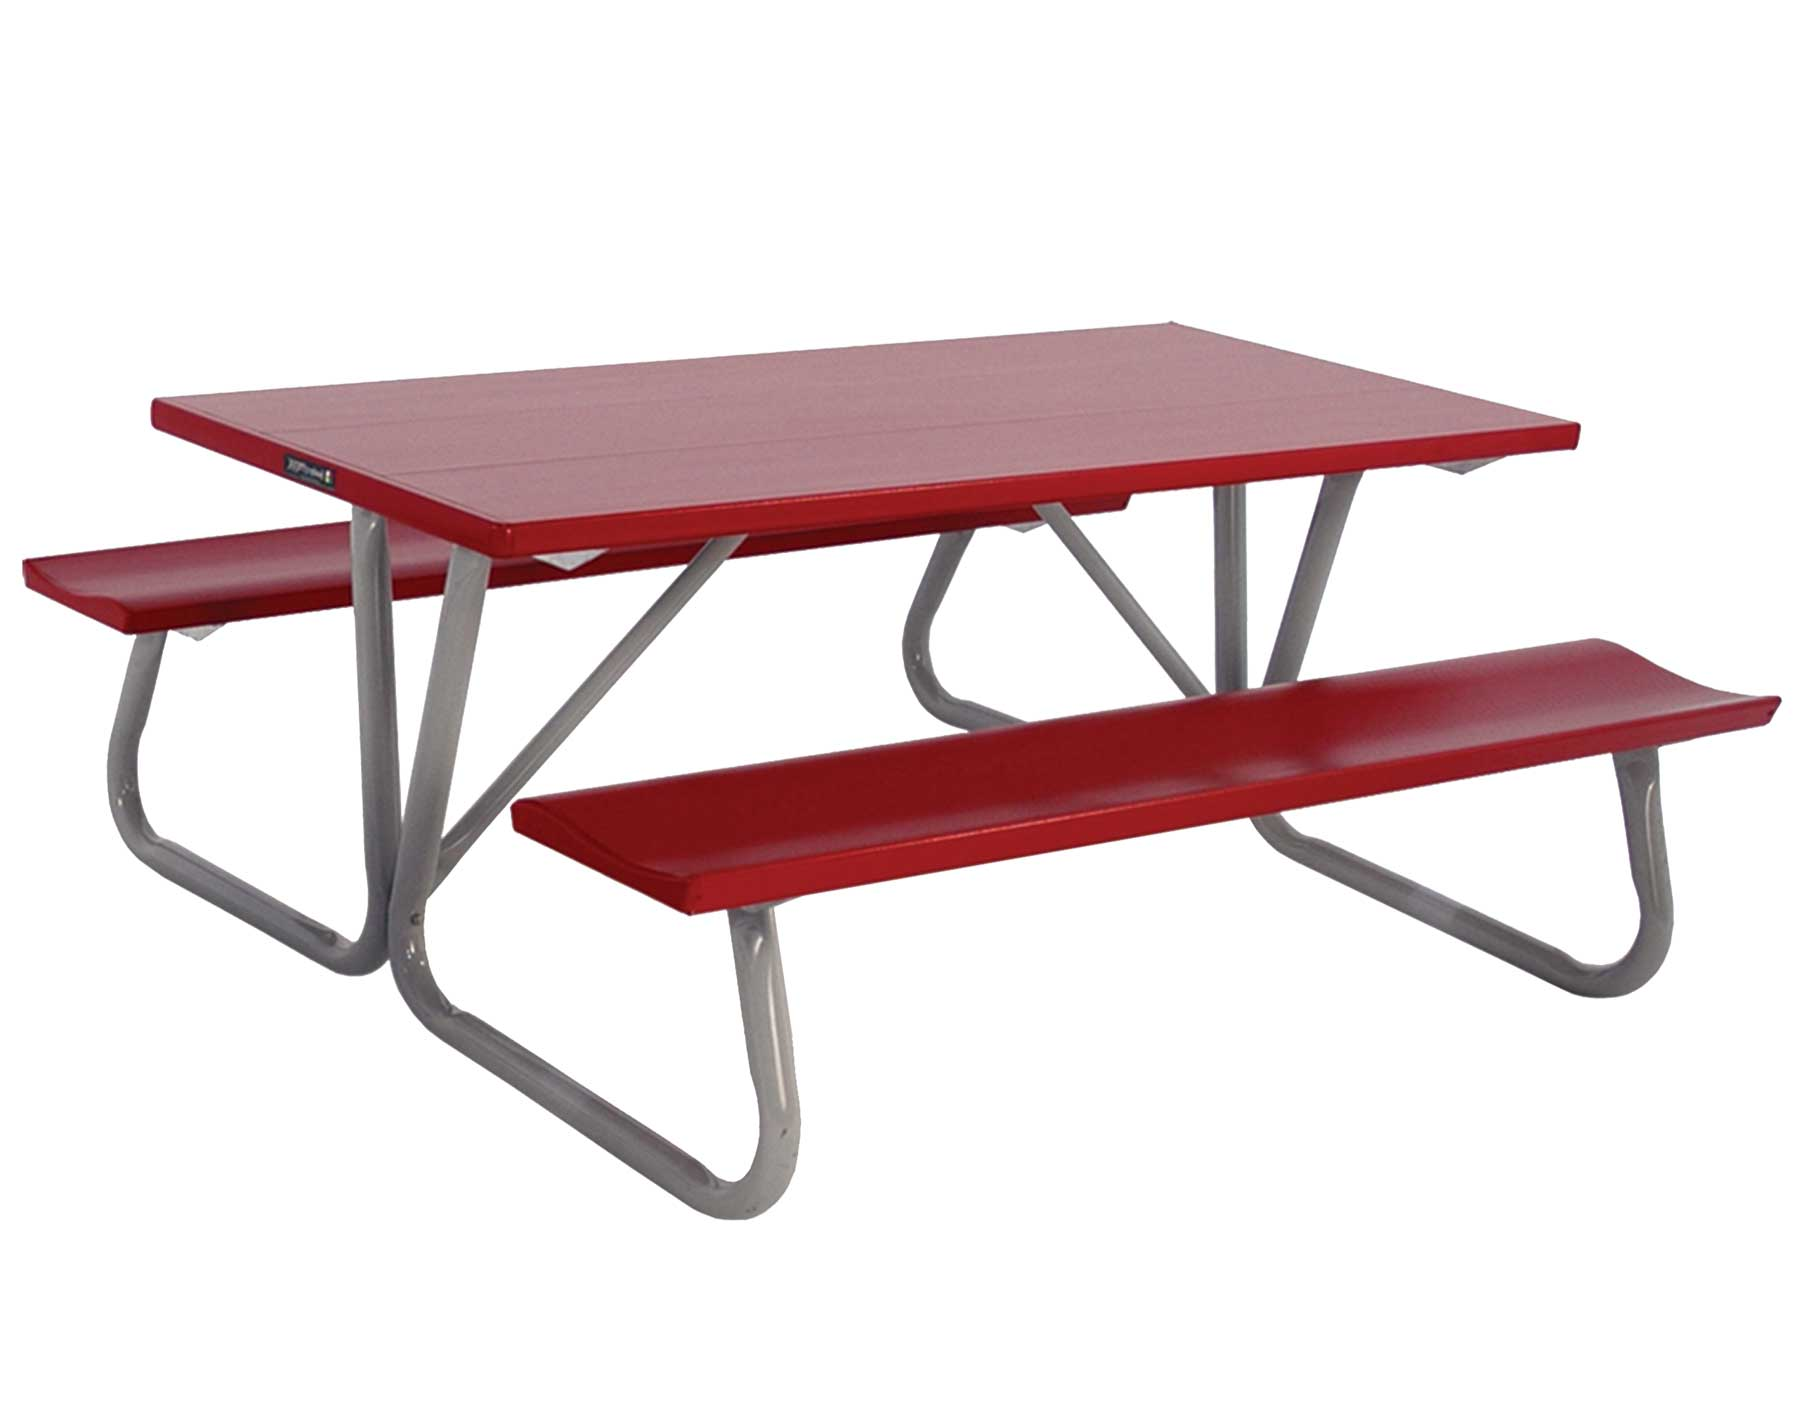 Picnic Table Clip Art picnic 20table 20clip 20art